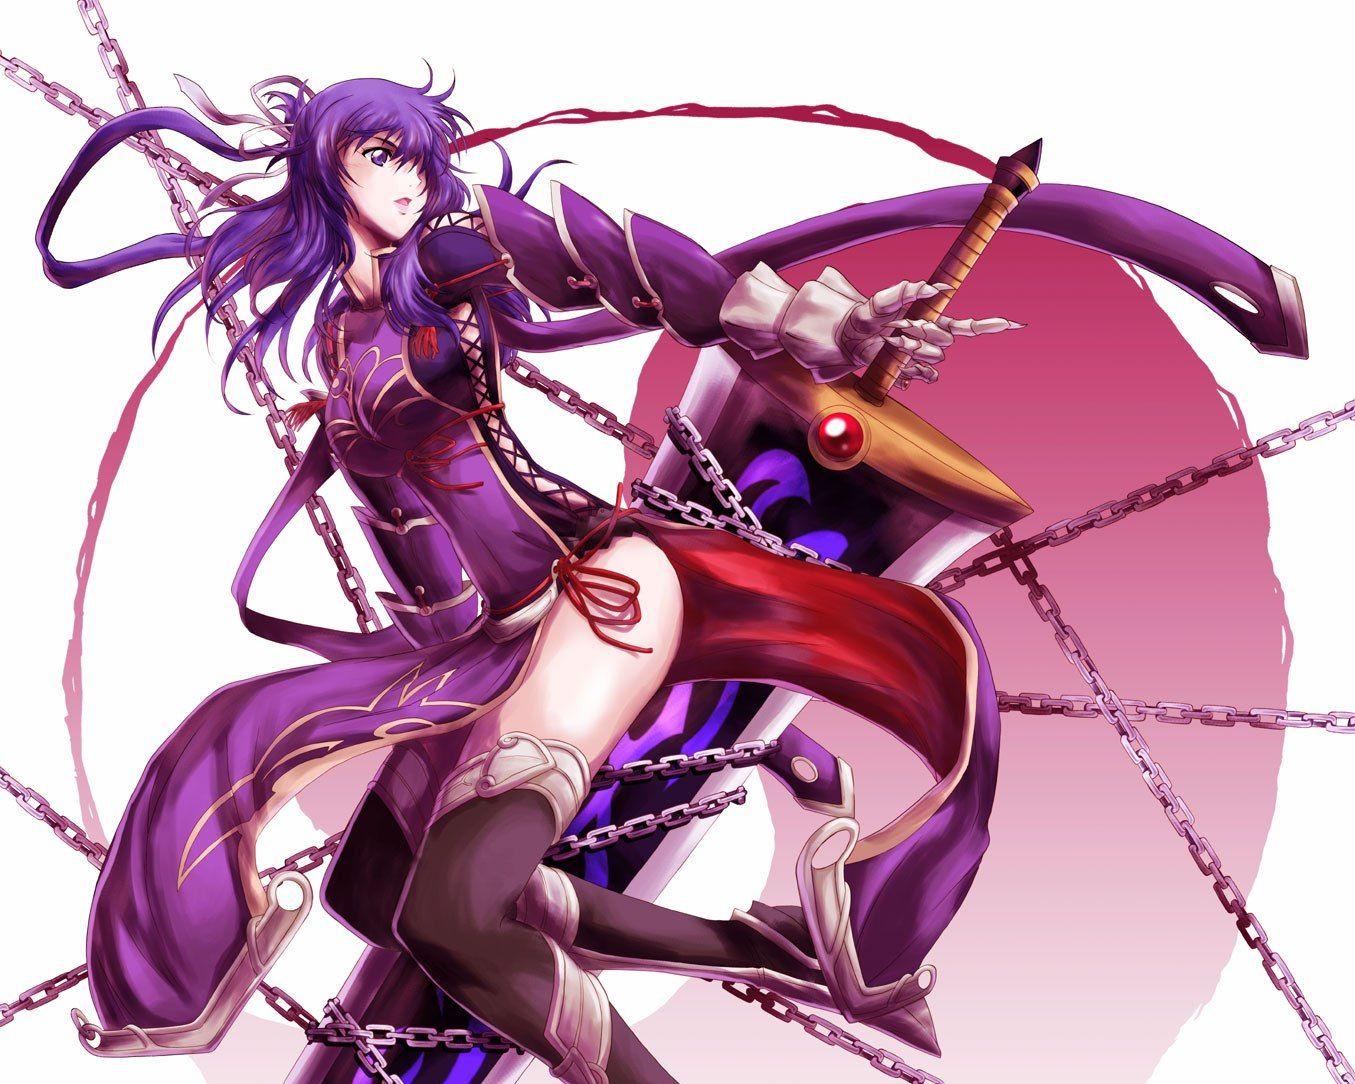 Pin By Josh Head On The Art Of The Female Warrior Anime Warrior Anime Anime School Girl